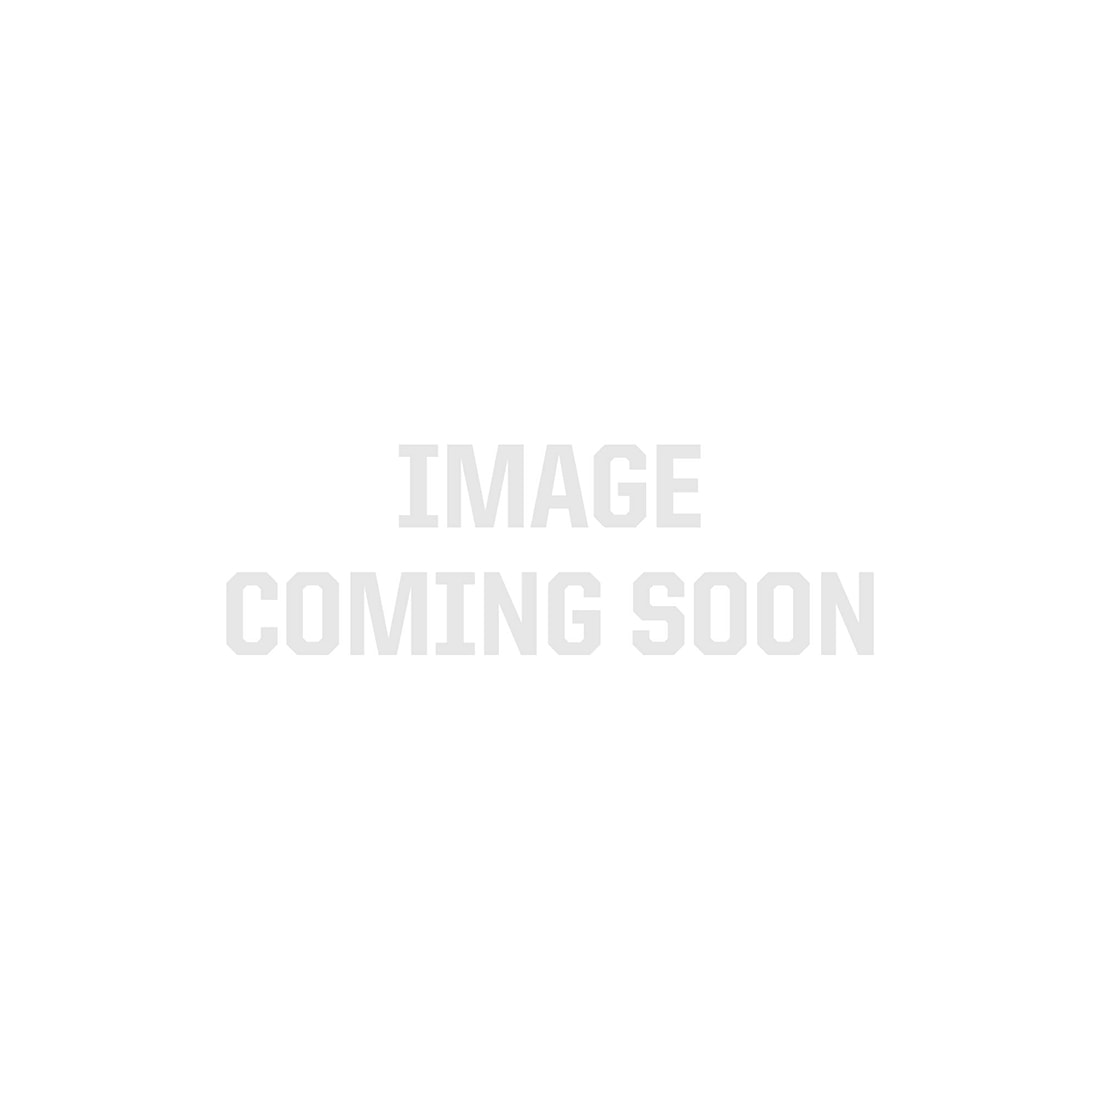 Dimmable 4 inch LED Downlight Retrofit Fixture 9 Watt 120 to 277 VAC Soft White 3,000K MaxLite